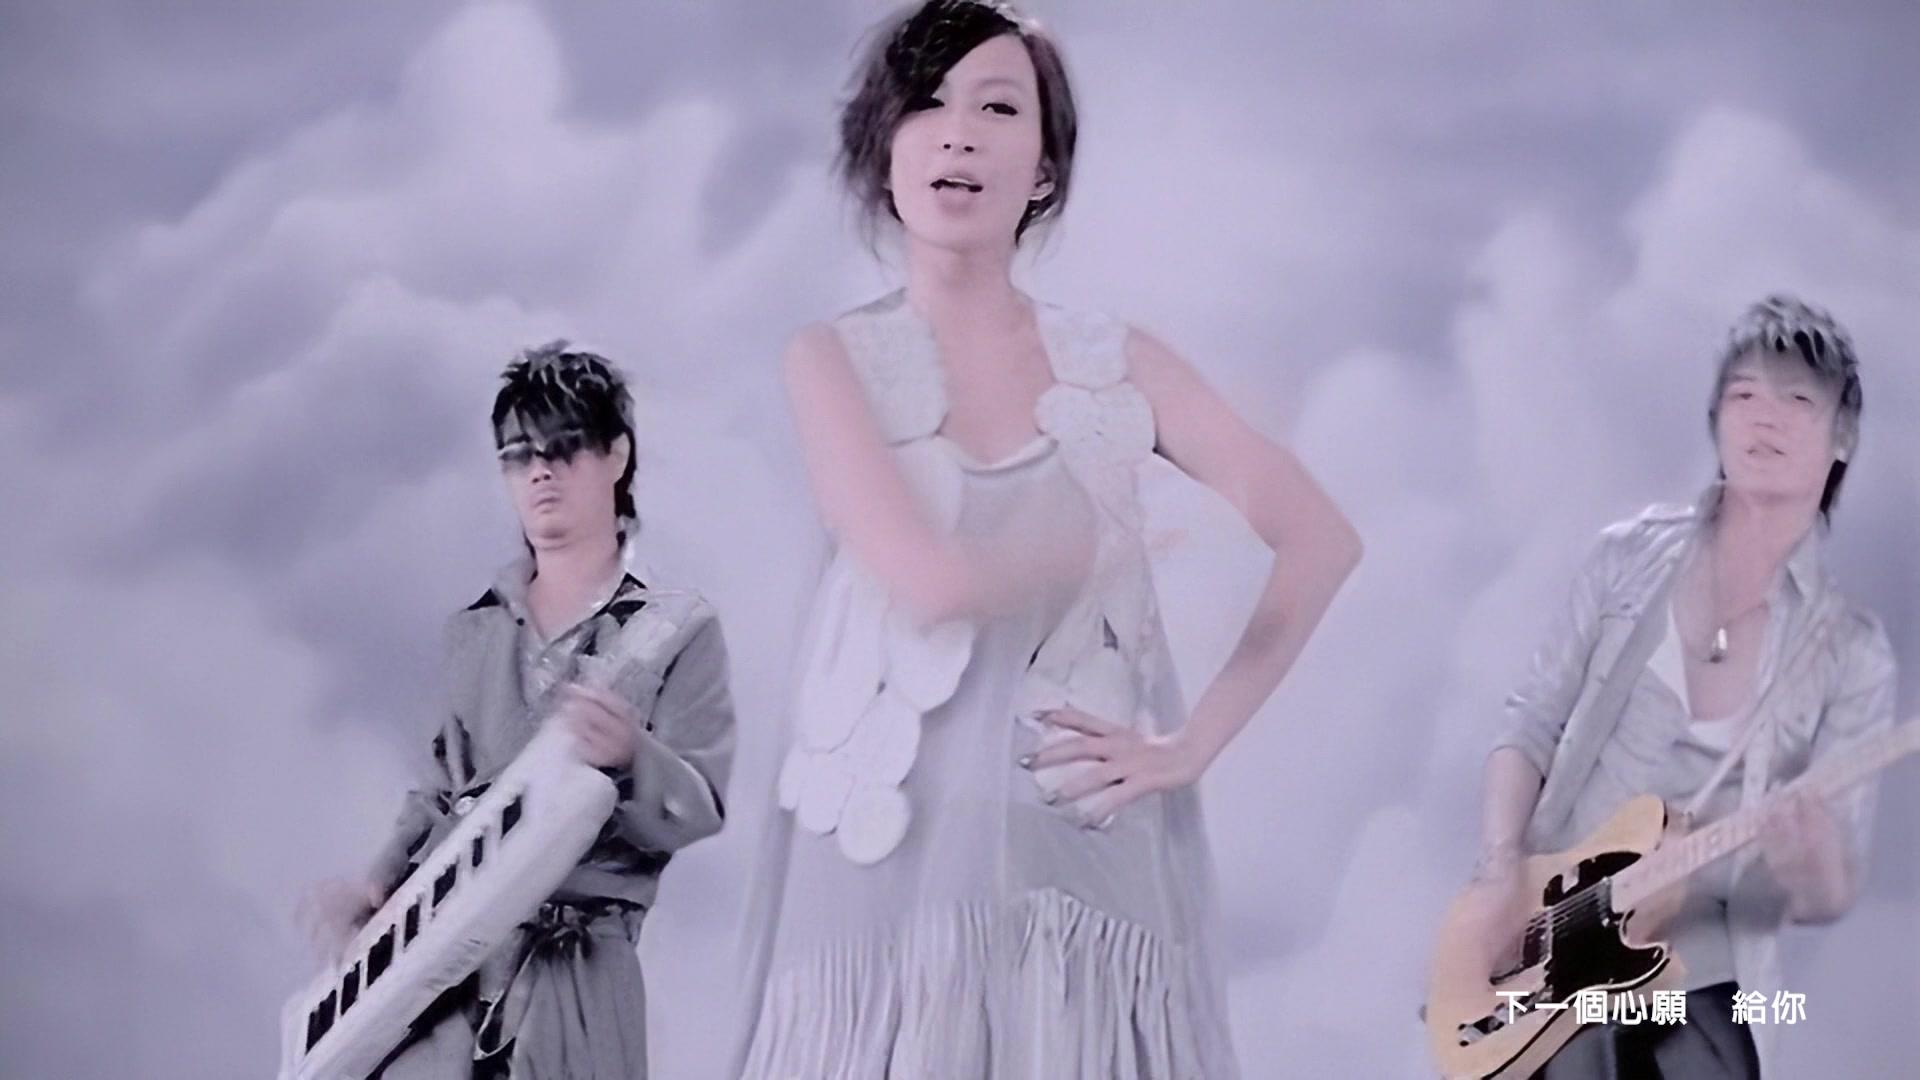 【1080P修复】F.I.R飞儿乐团 - 三个心愿MV 修复版